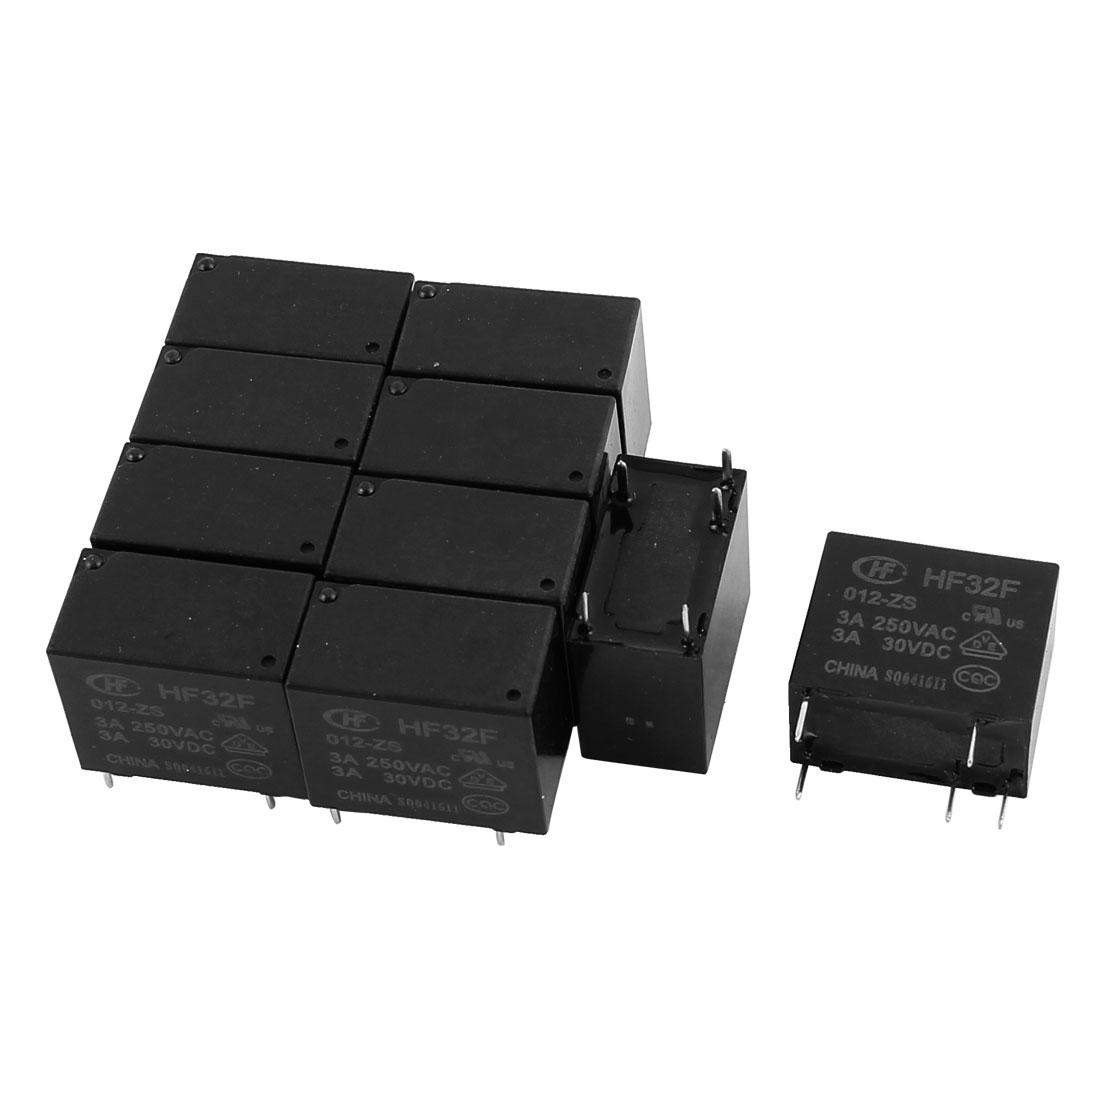 10 Pcs 30VDC 250VAC 3A 5 Terminal SPDT Conversion HF32F-012-ZS Power Relay